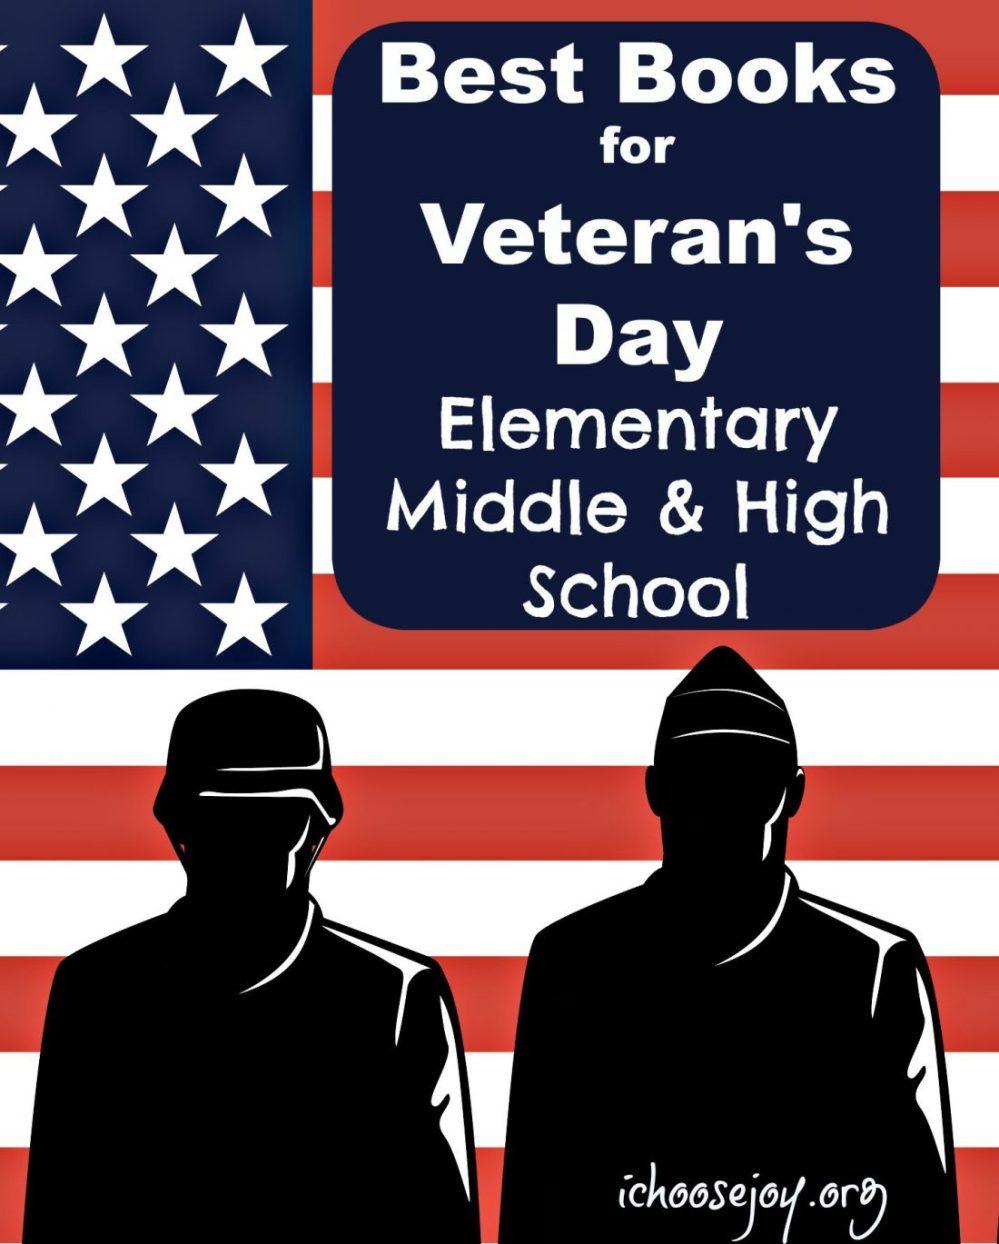 medium resolution of Veterans Day Book Ideas for Elementary